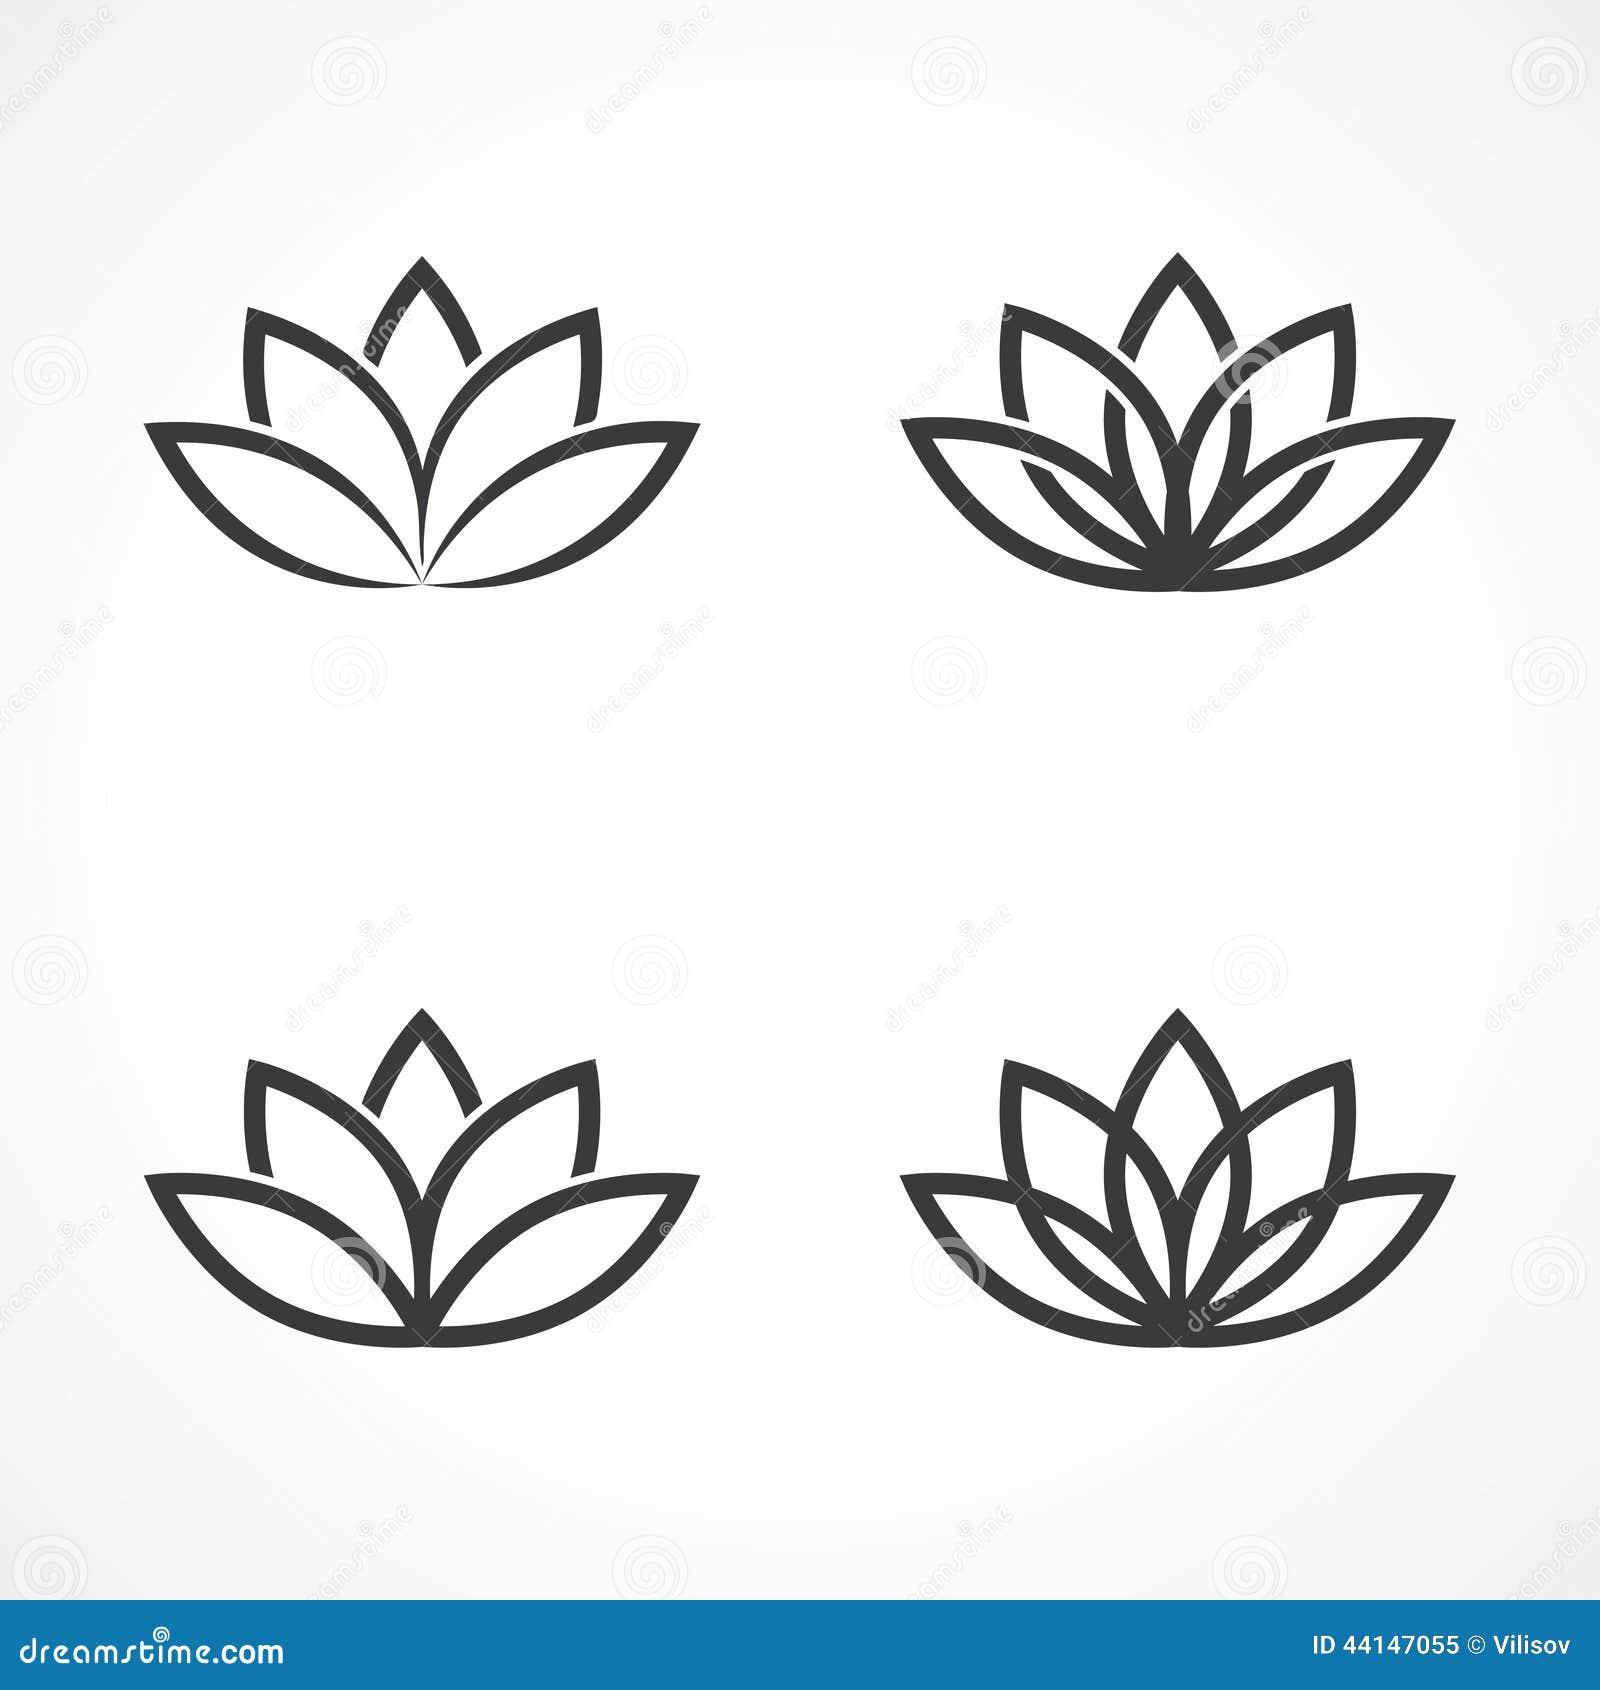 Lotus symbol stock vector illustration of beauty corporate 44147055 lotus symbol mightylinksfo Images